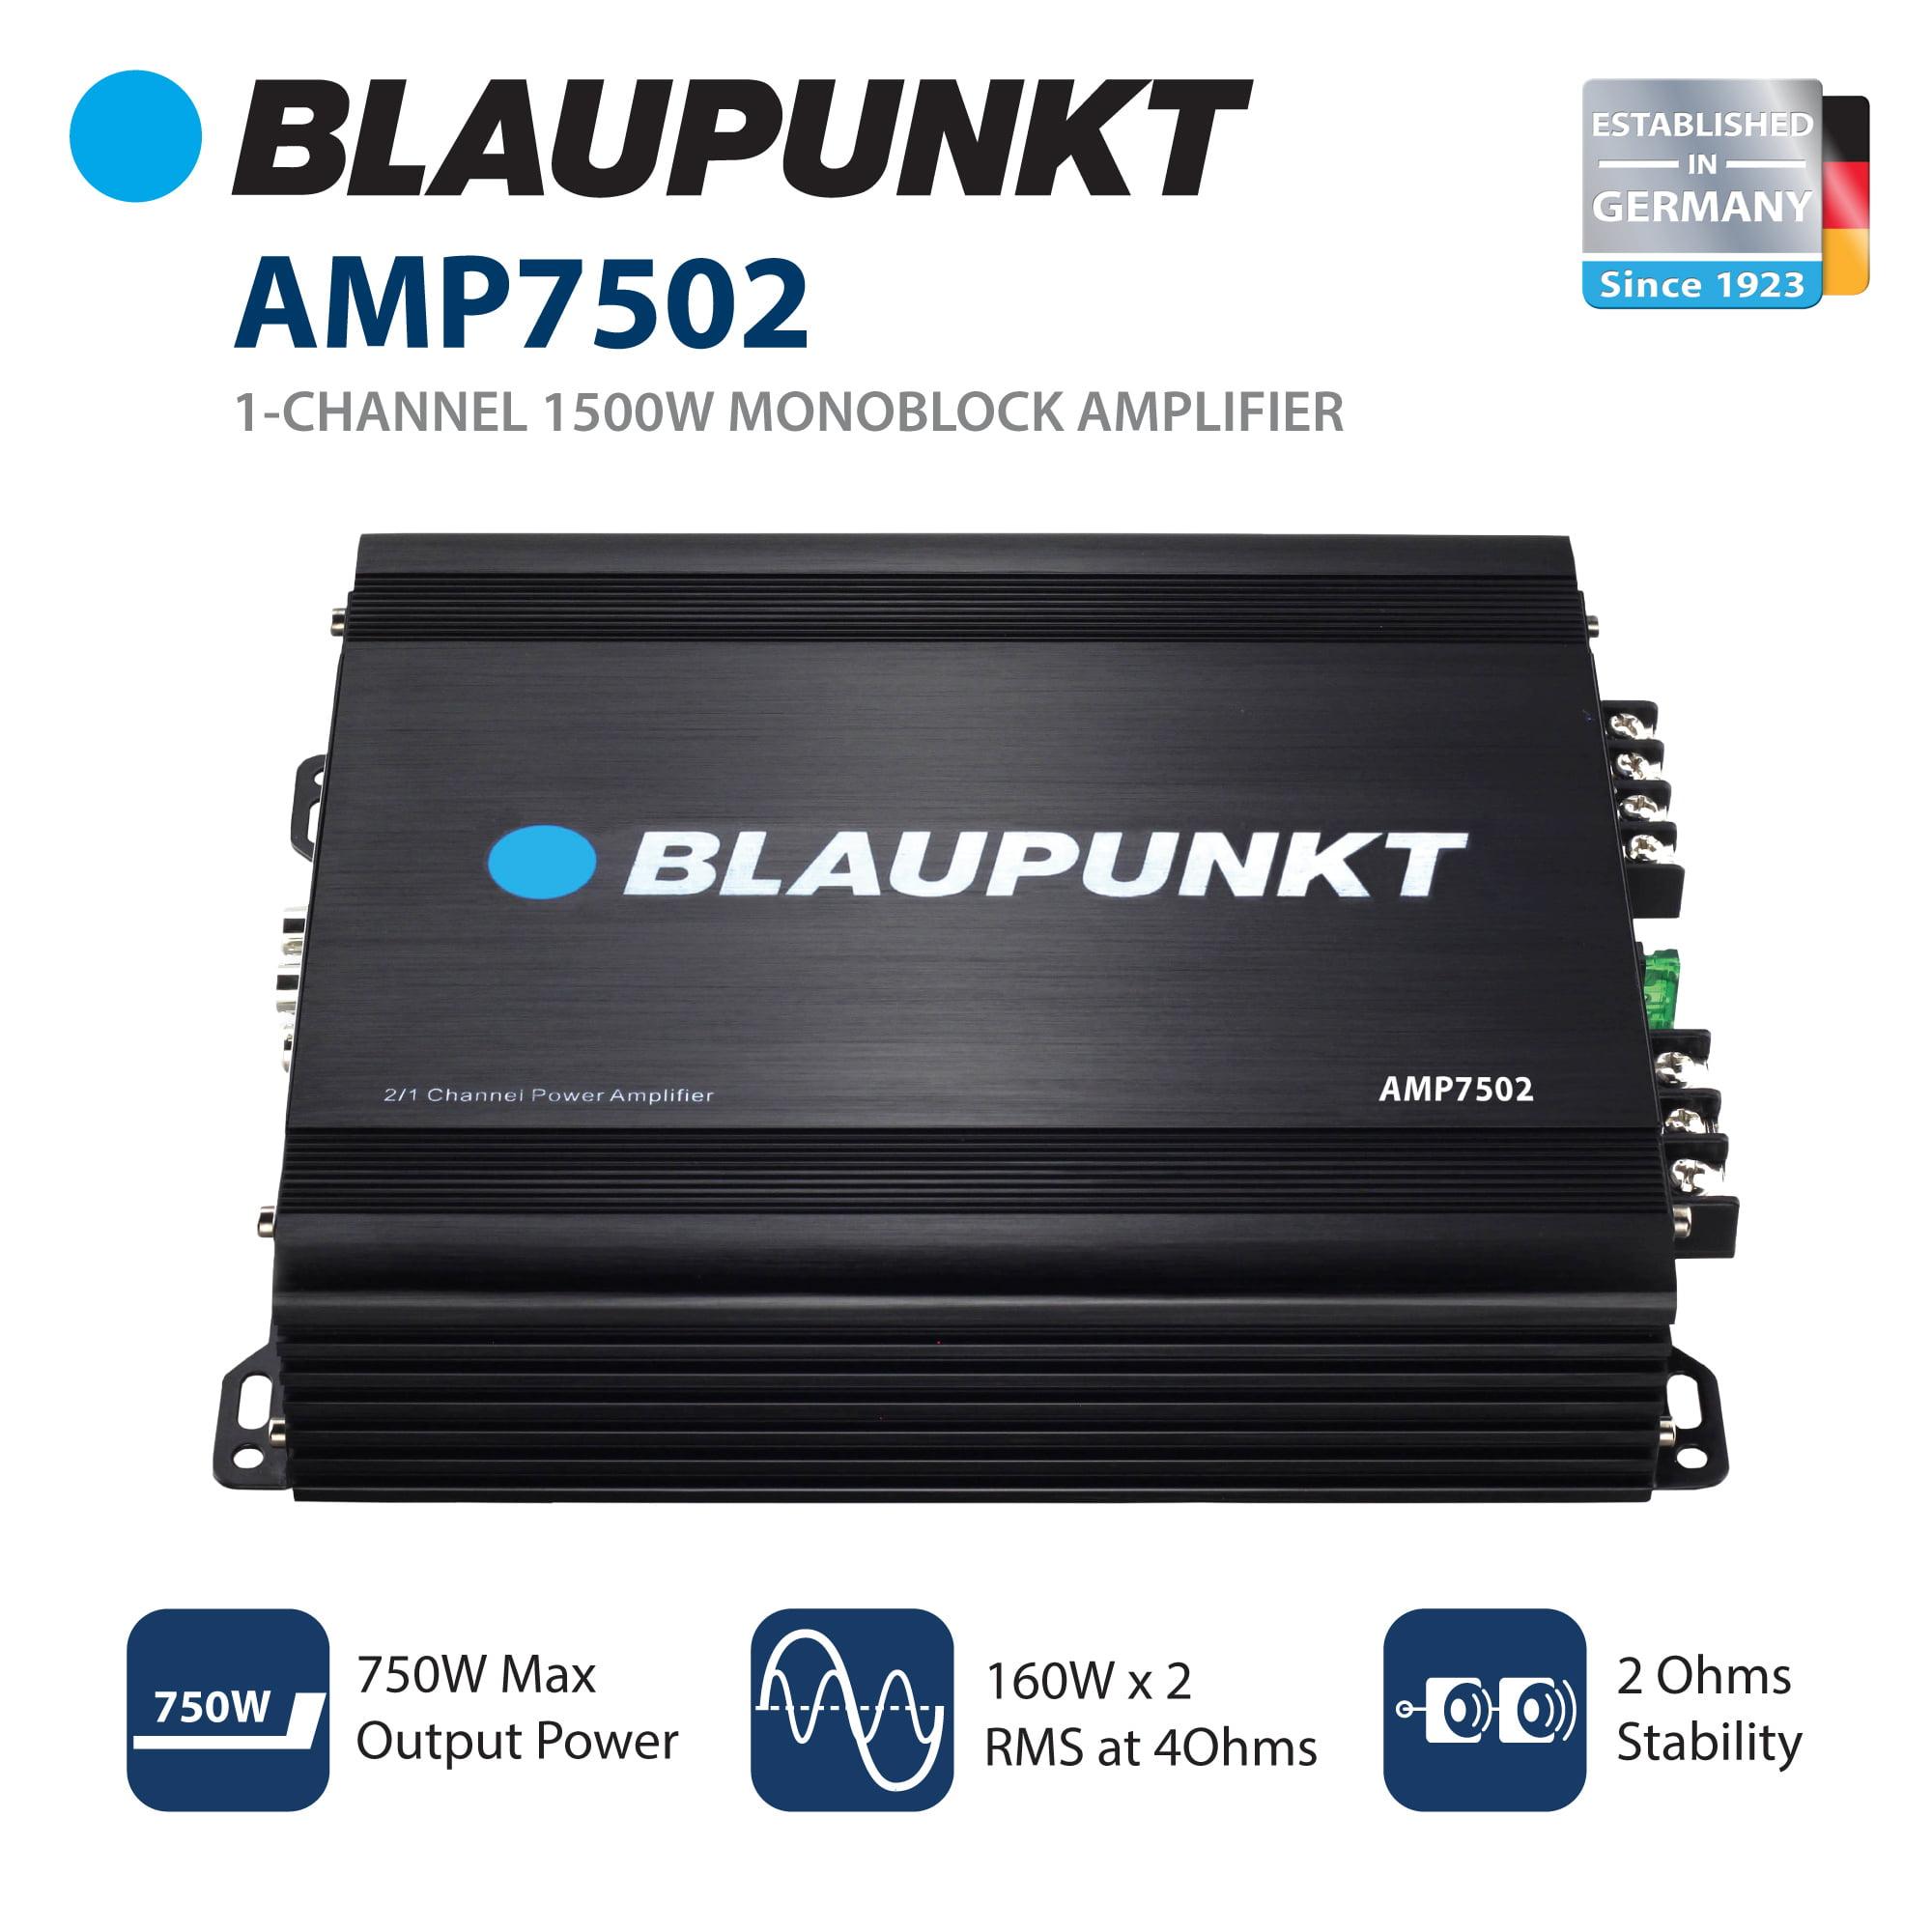 Blaupunkt AMP1501 Car Monoblock Amplifier 1-Channel 1500W